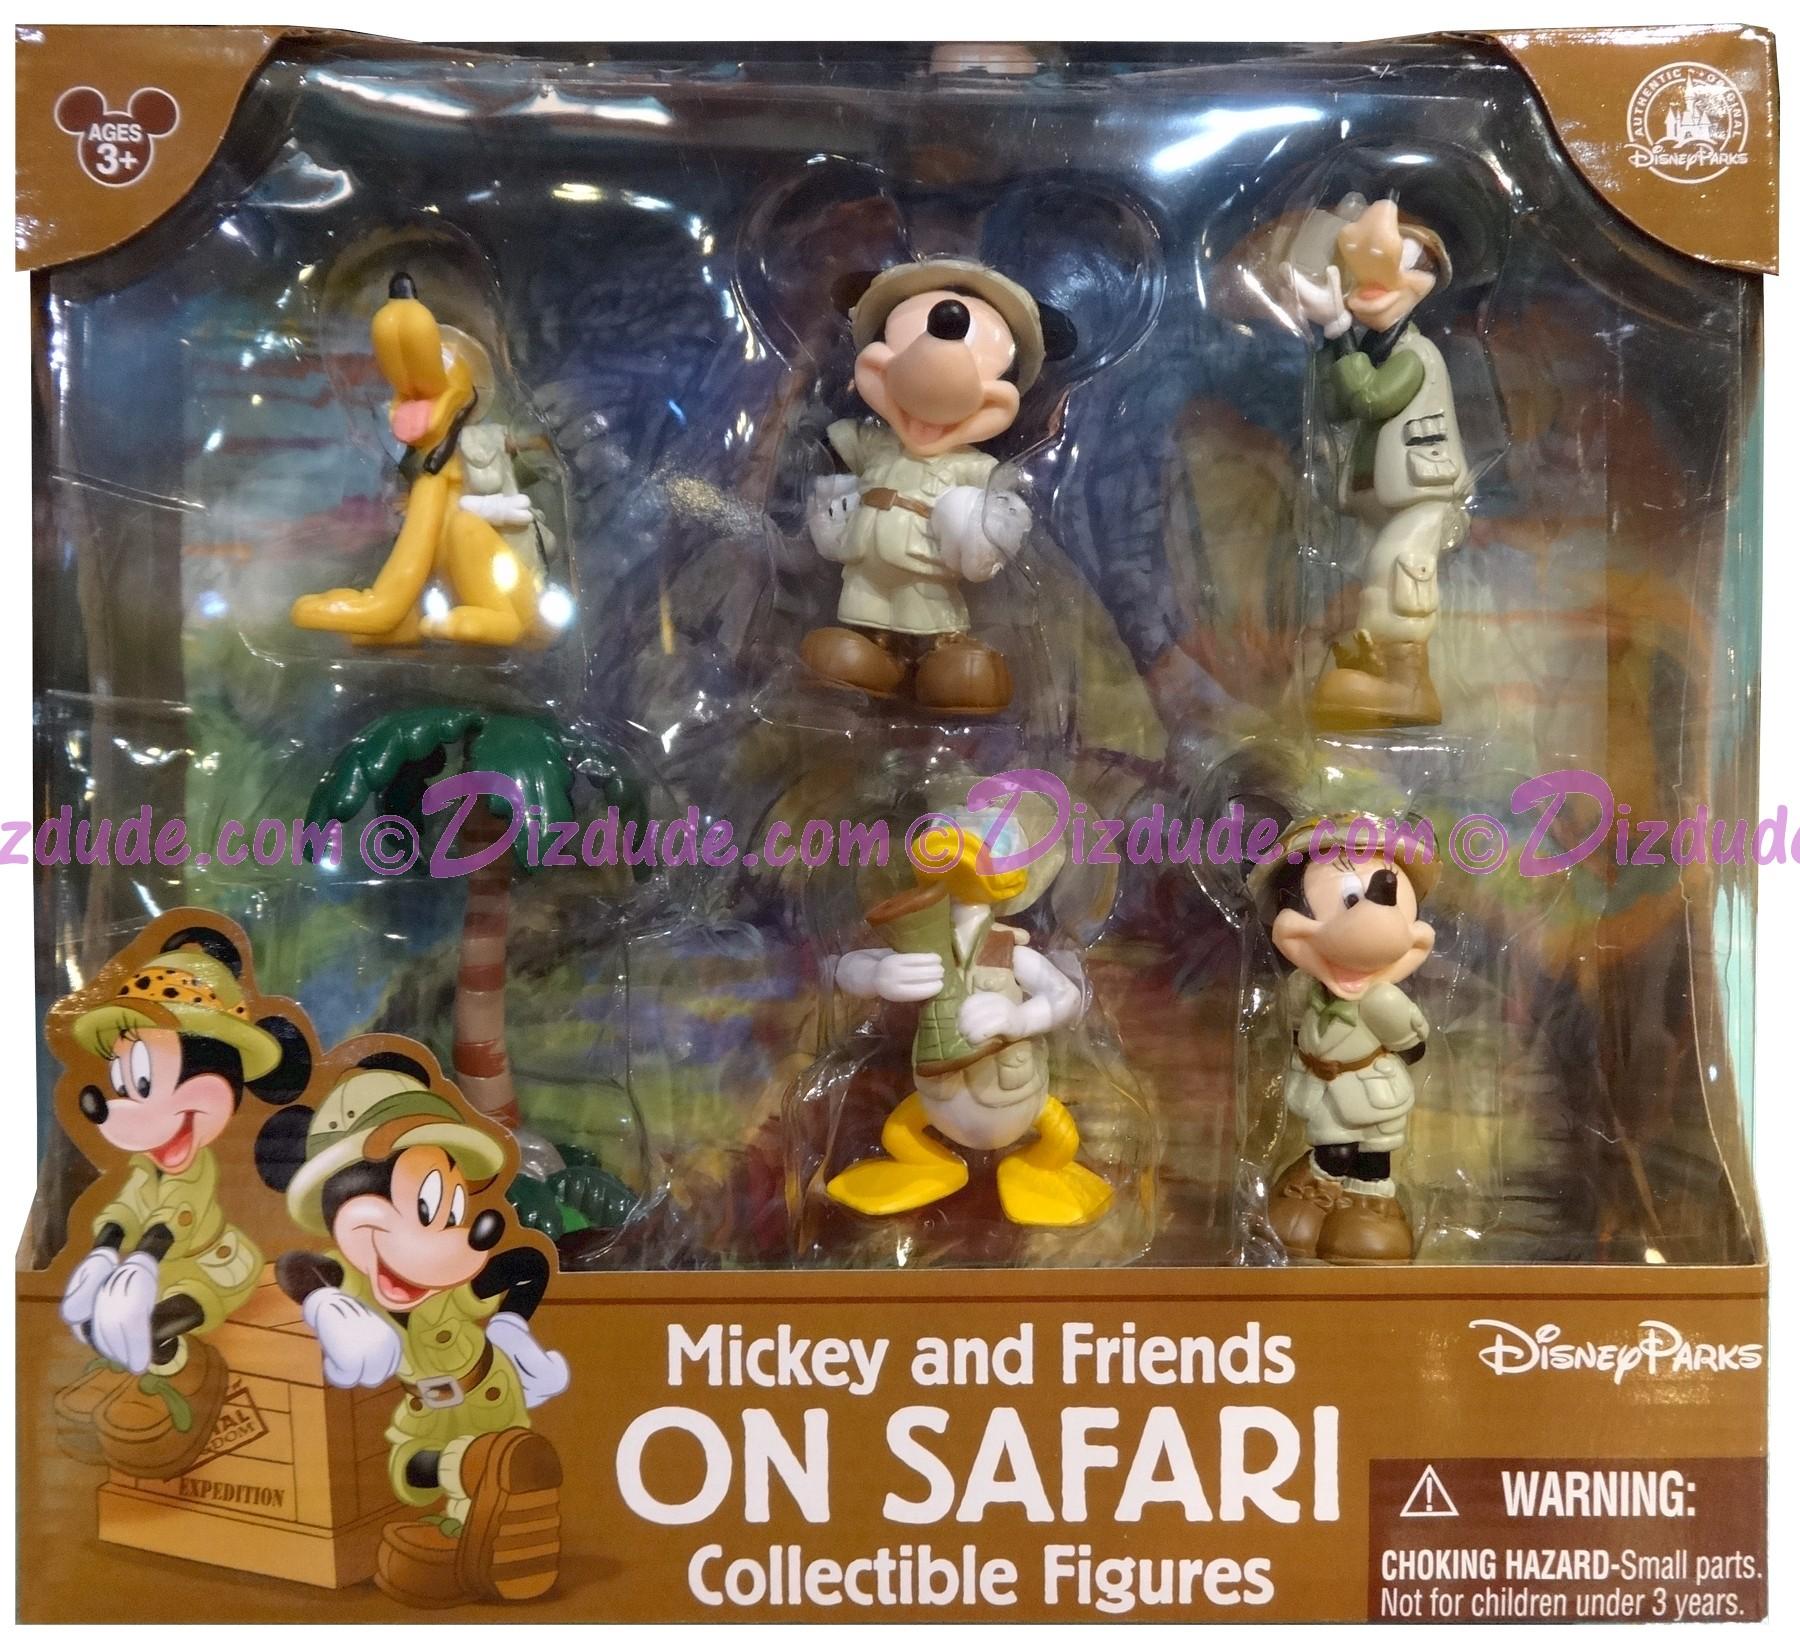 Disney Mickey and Friends on Safari Collectible Figures © Dizdude.com